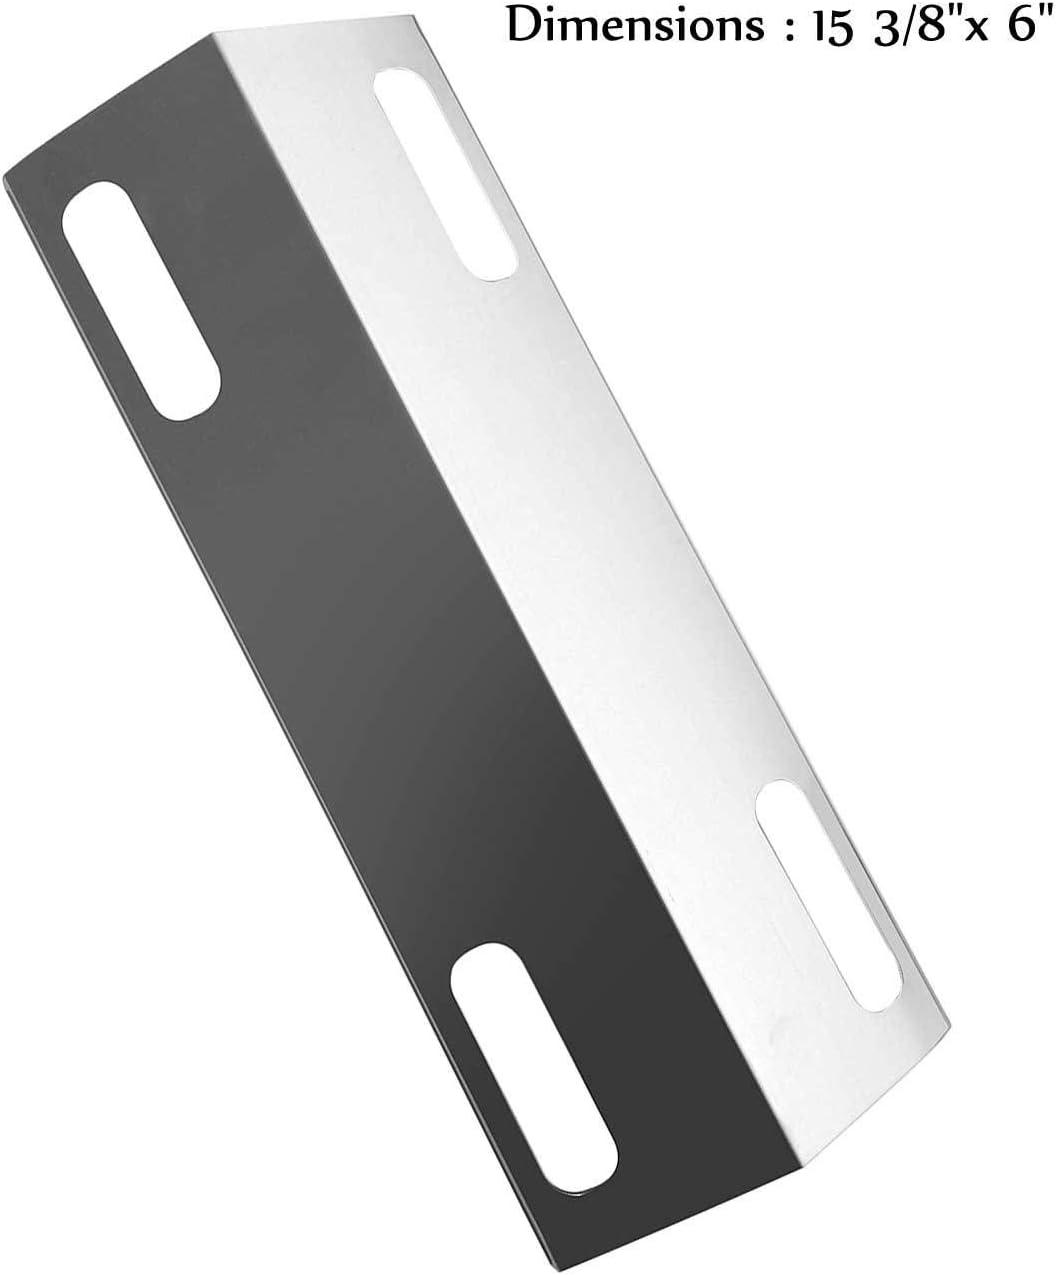 Heat Plates for Ducane 30732301,Affinity 3400,30741201,30741201,4200 Models